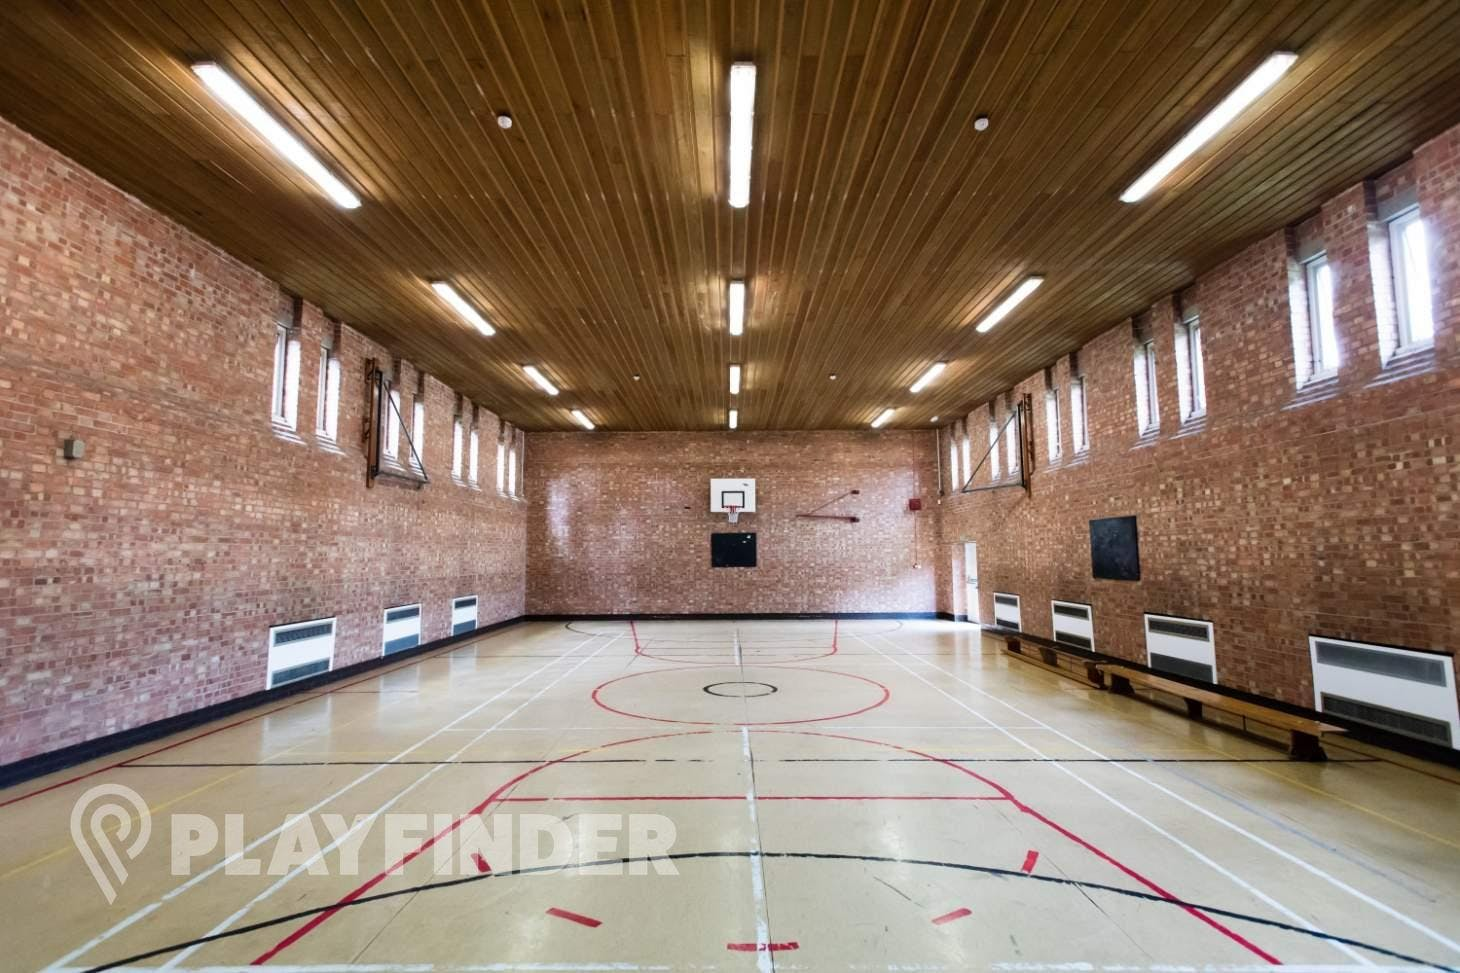 Marcus Lipton Community Enterprise Indoor futsal pitch